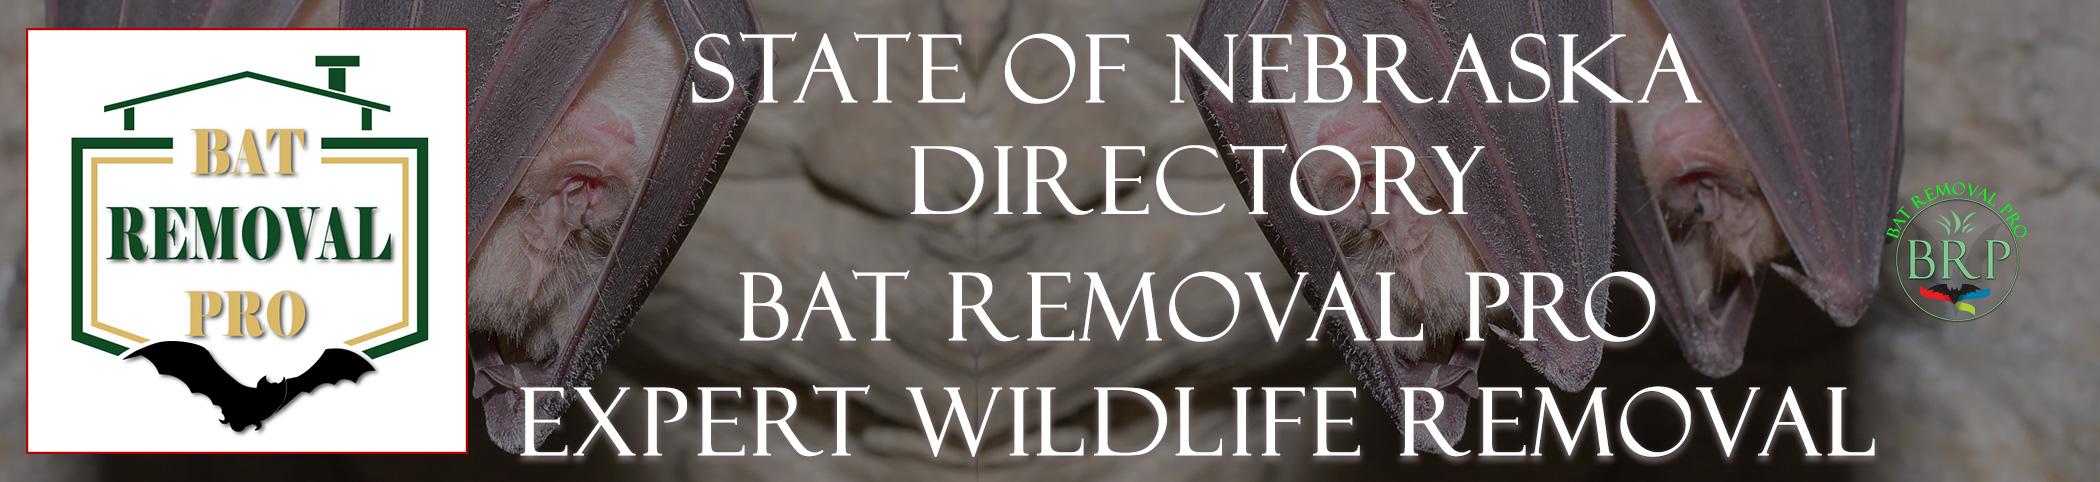 NEBRASKA-bat-removal-at-bat-removal-pro-header-image